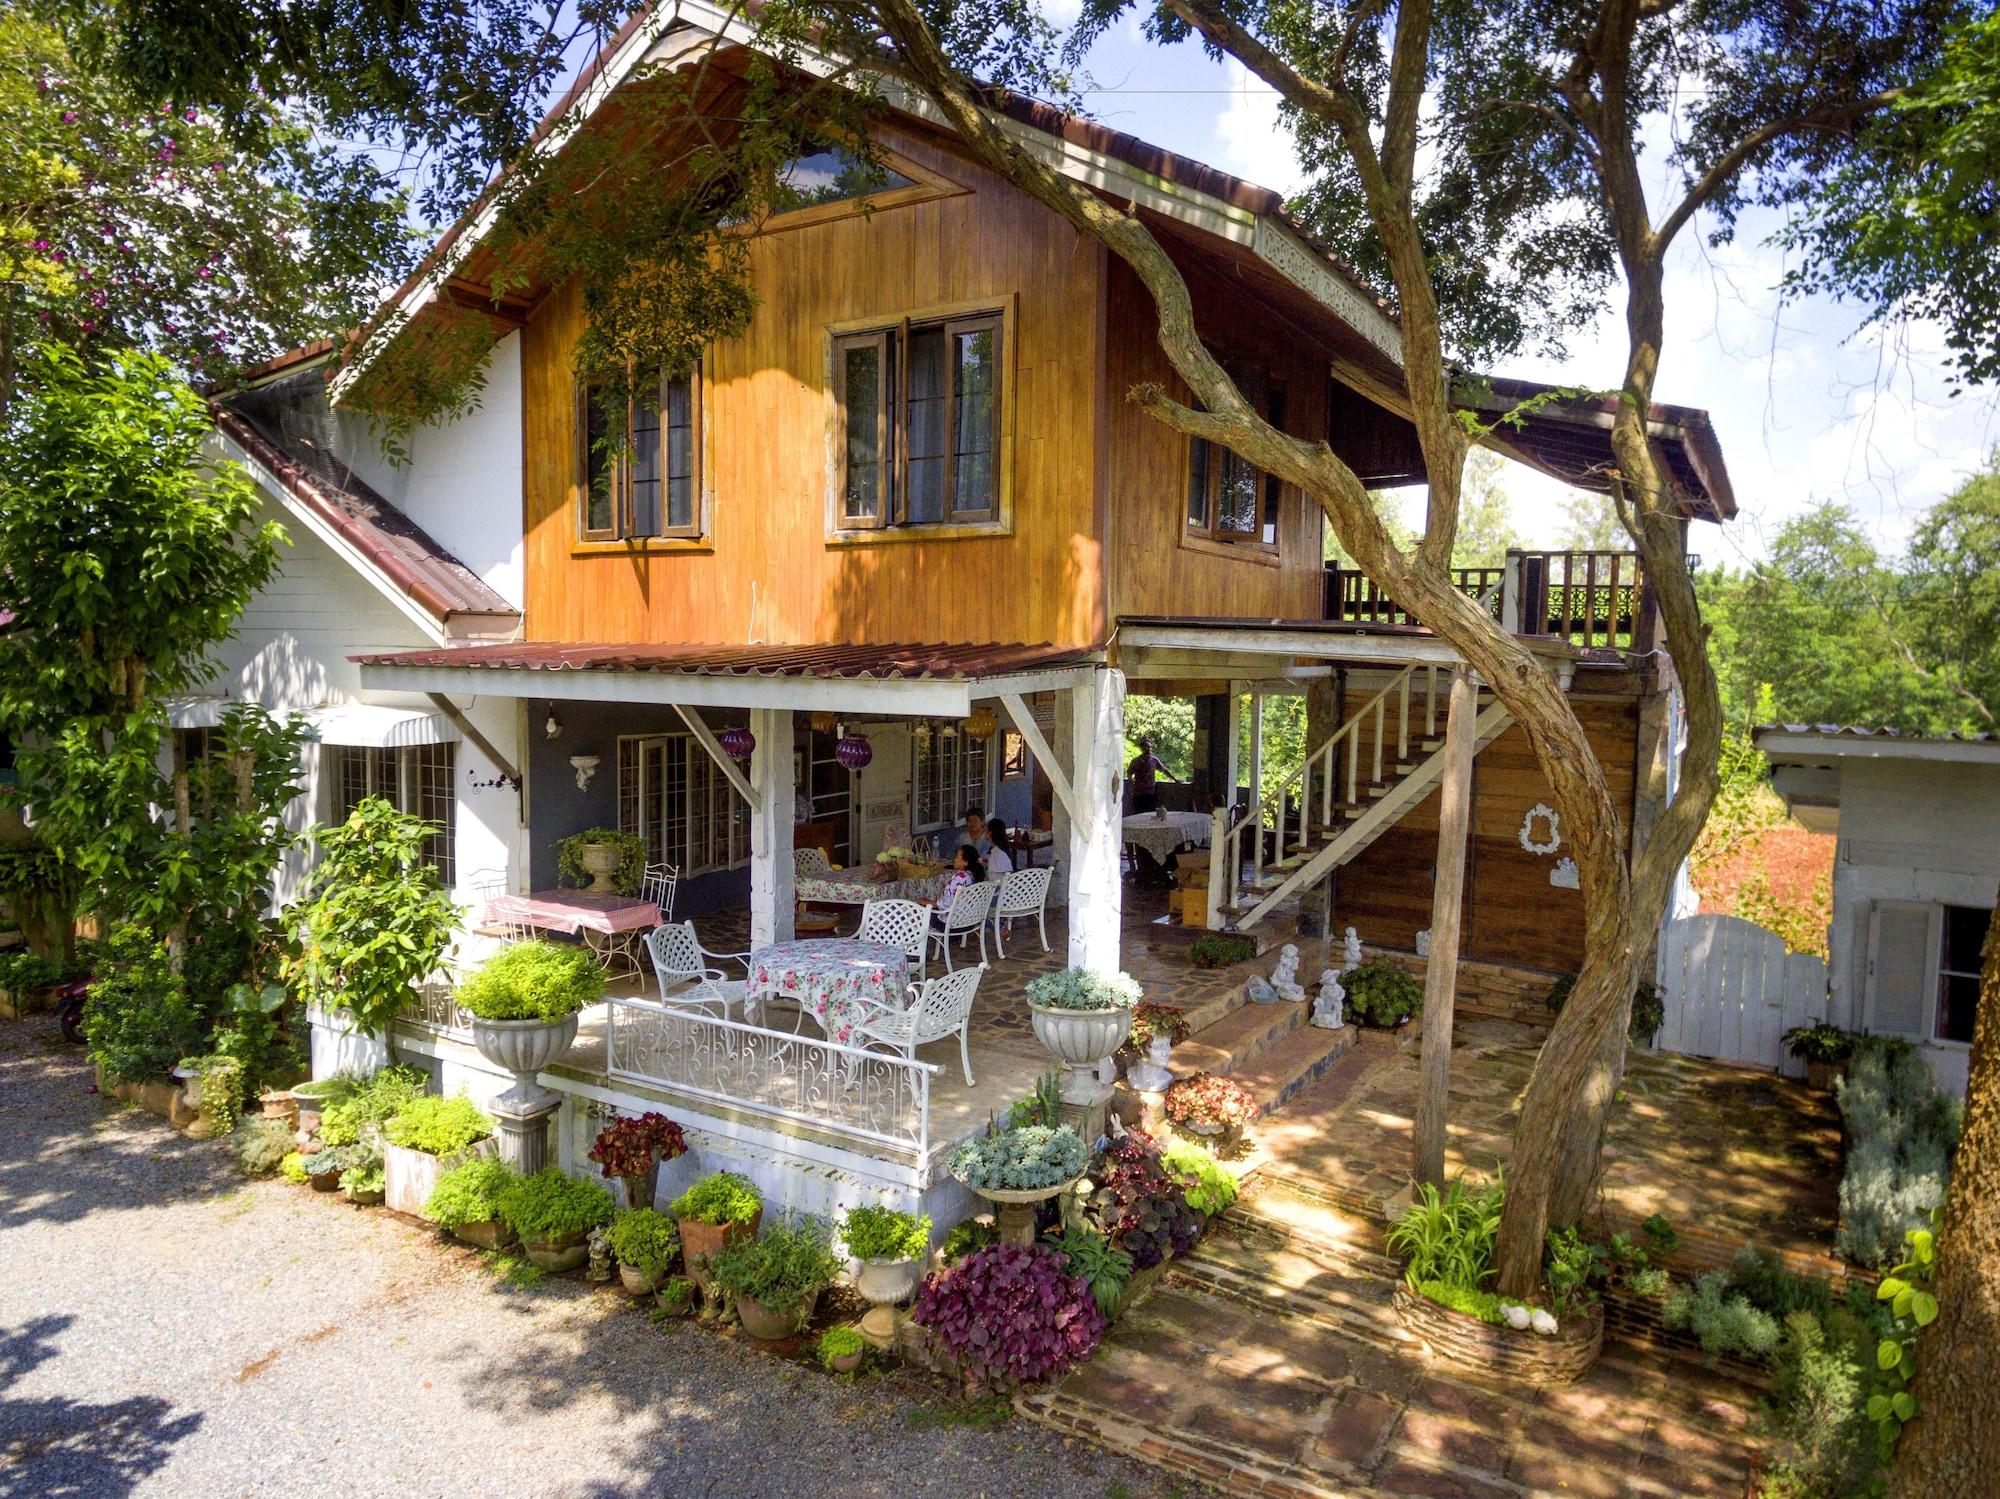 Rosemary House, Pak Chong